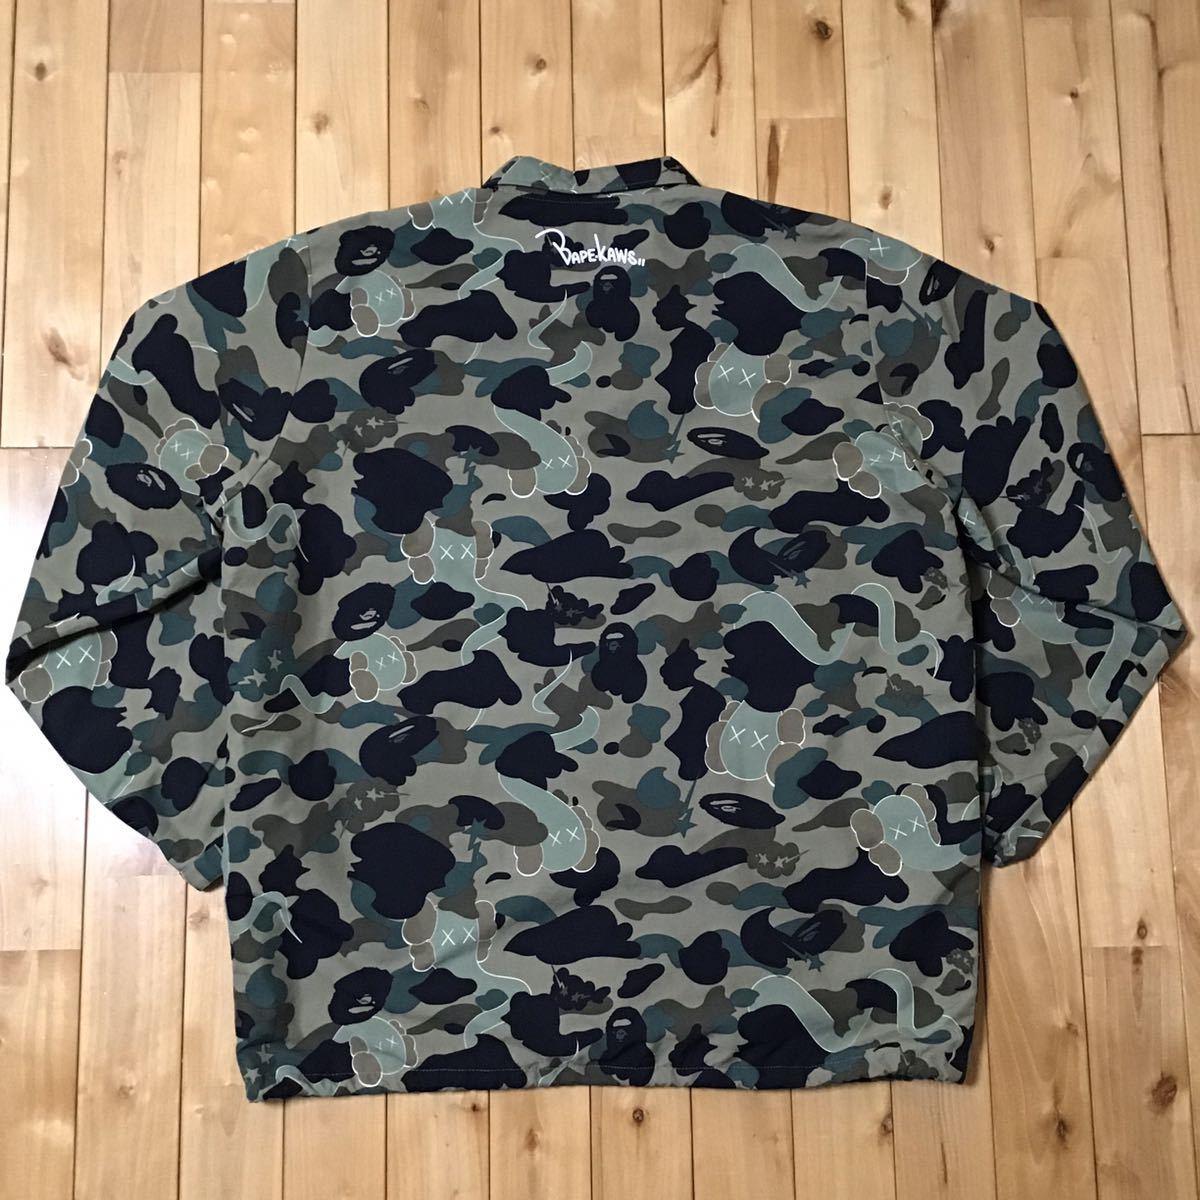 ★XXL★ kaws × BAPE bendy 1st camo コーチジャケット a bathing ape coach jacket エイプ ベイプ アベイシングエイプ カウズ 2XL nigo